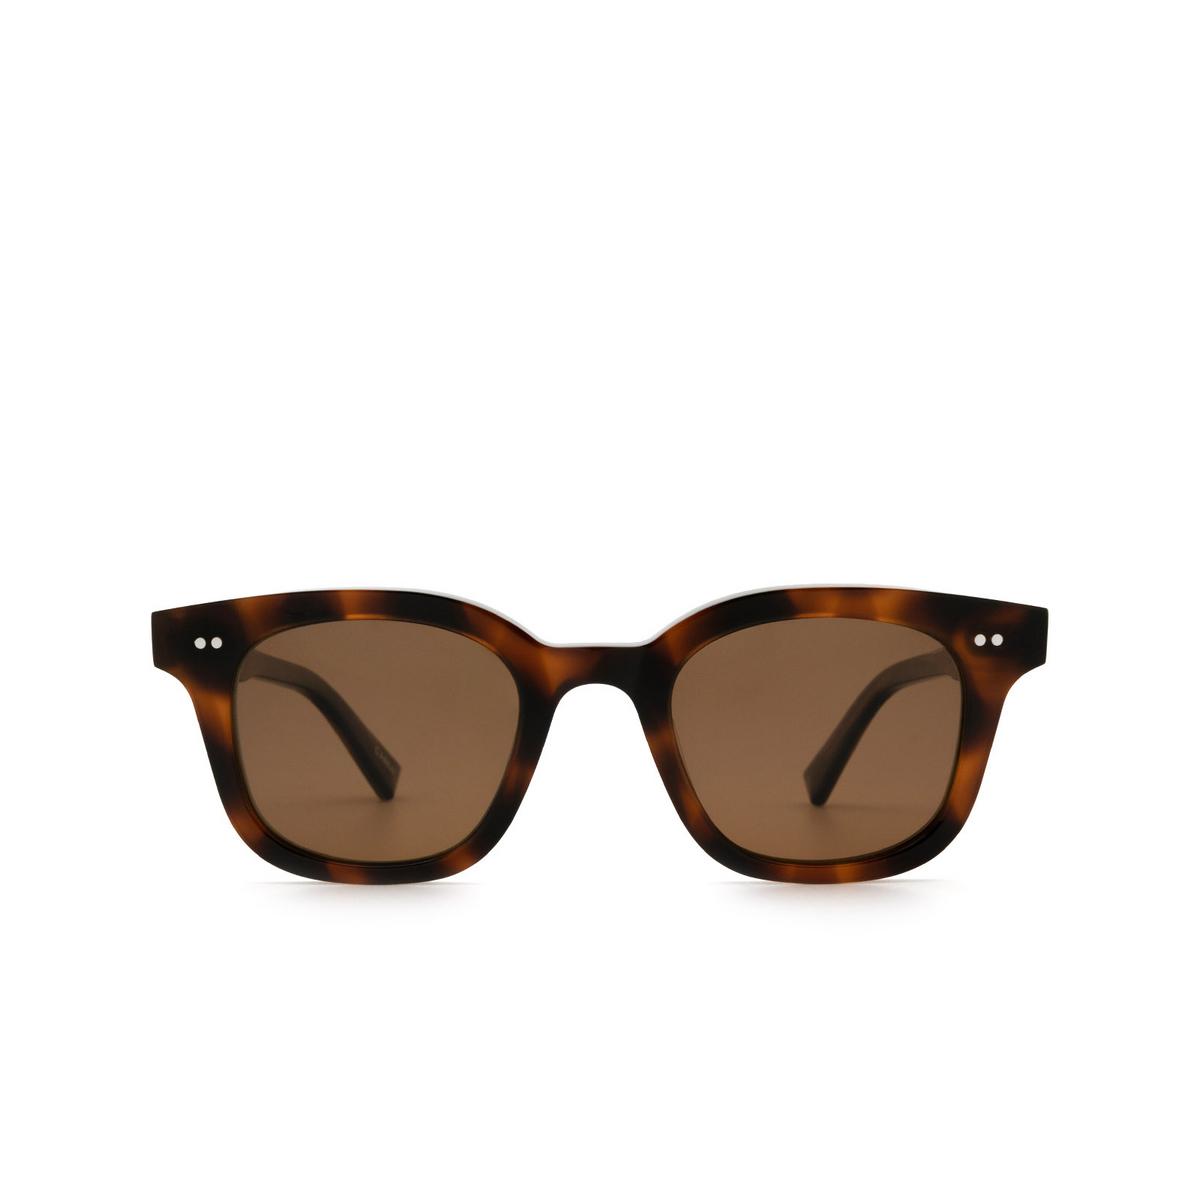 Chimi® Square Sunglasses: 02 color Tortoise - front view.